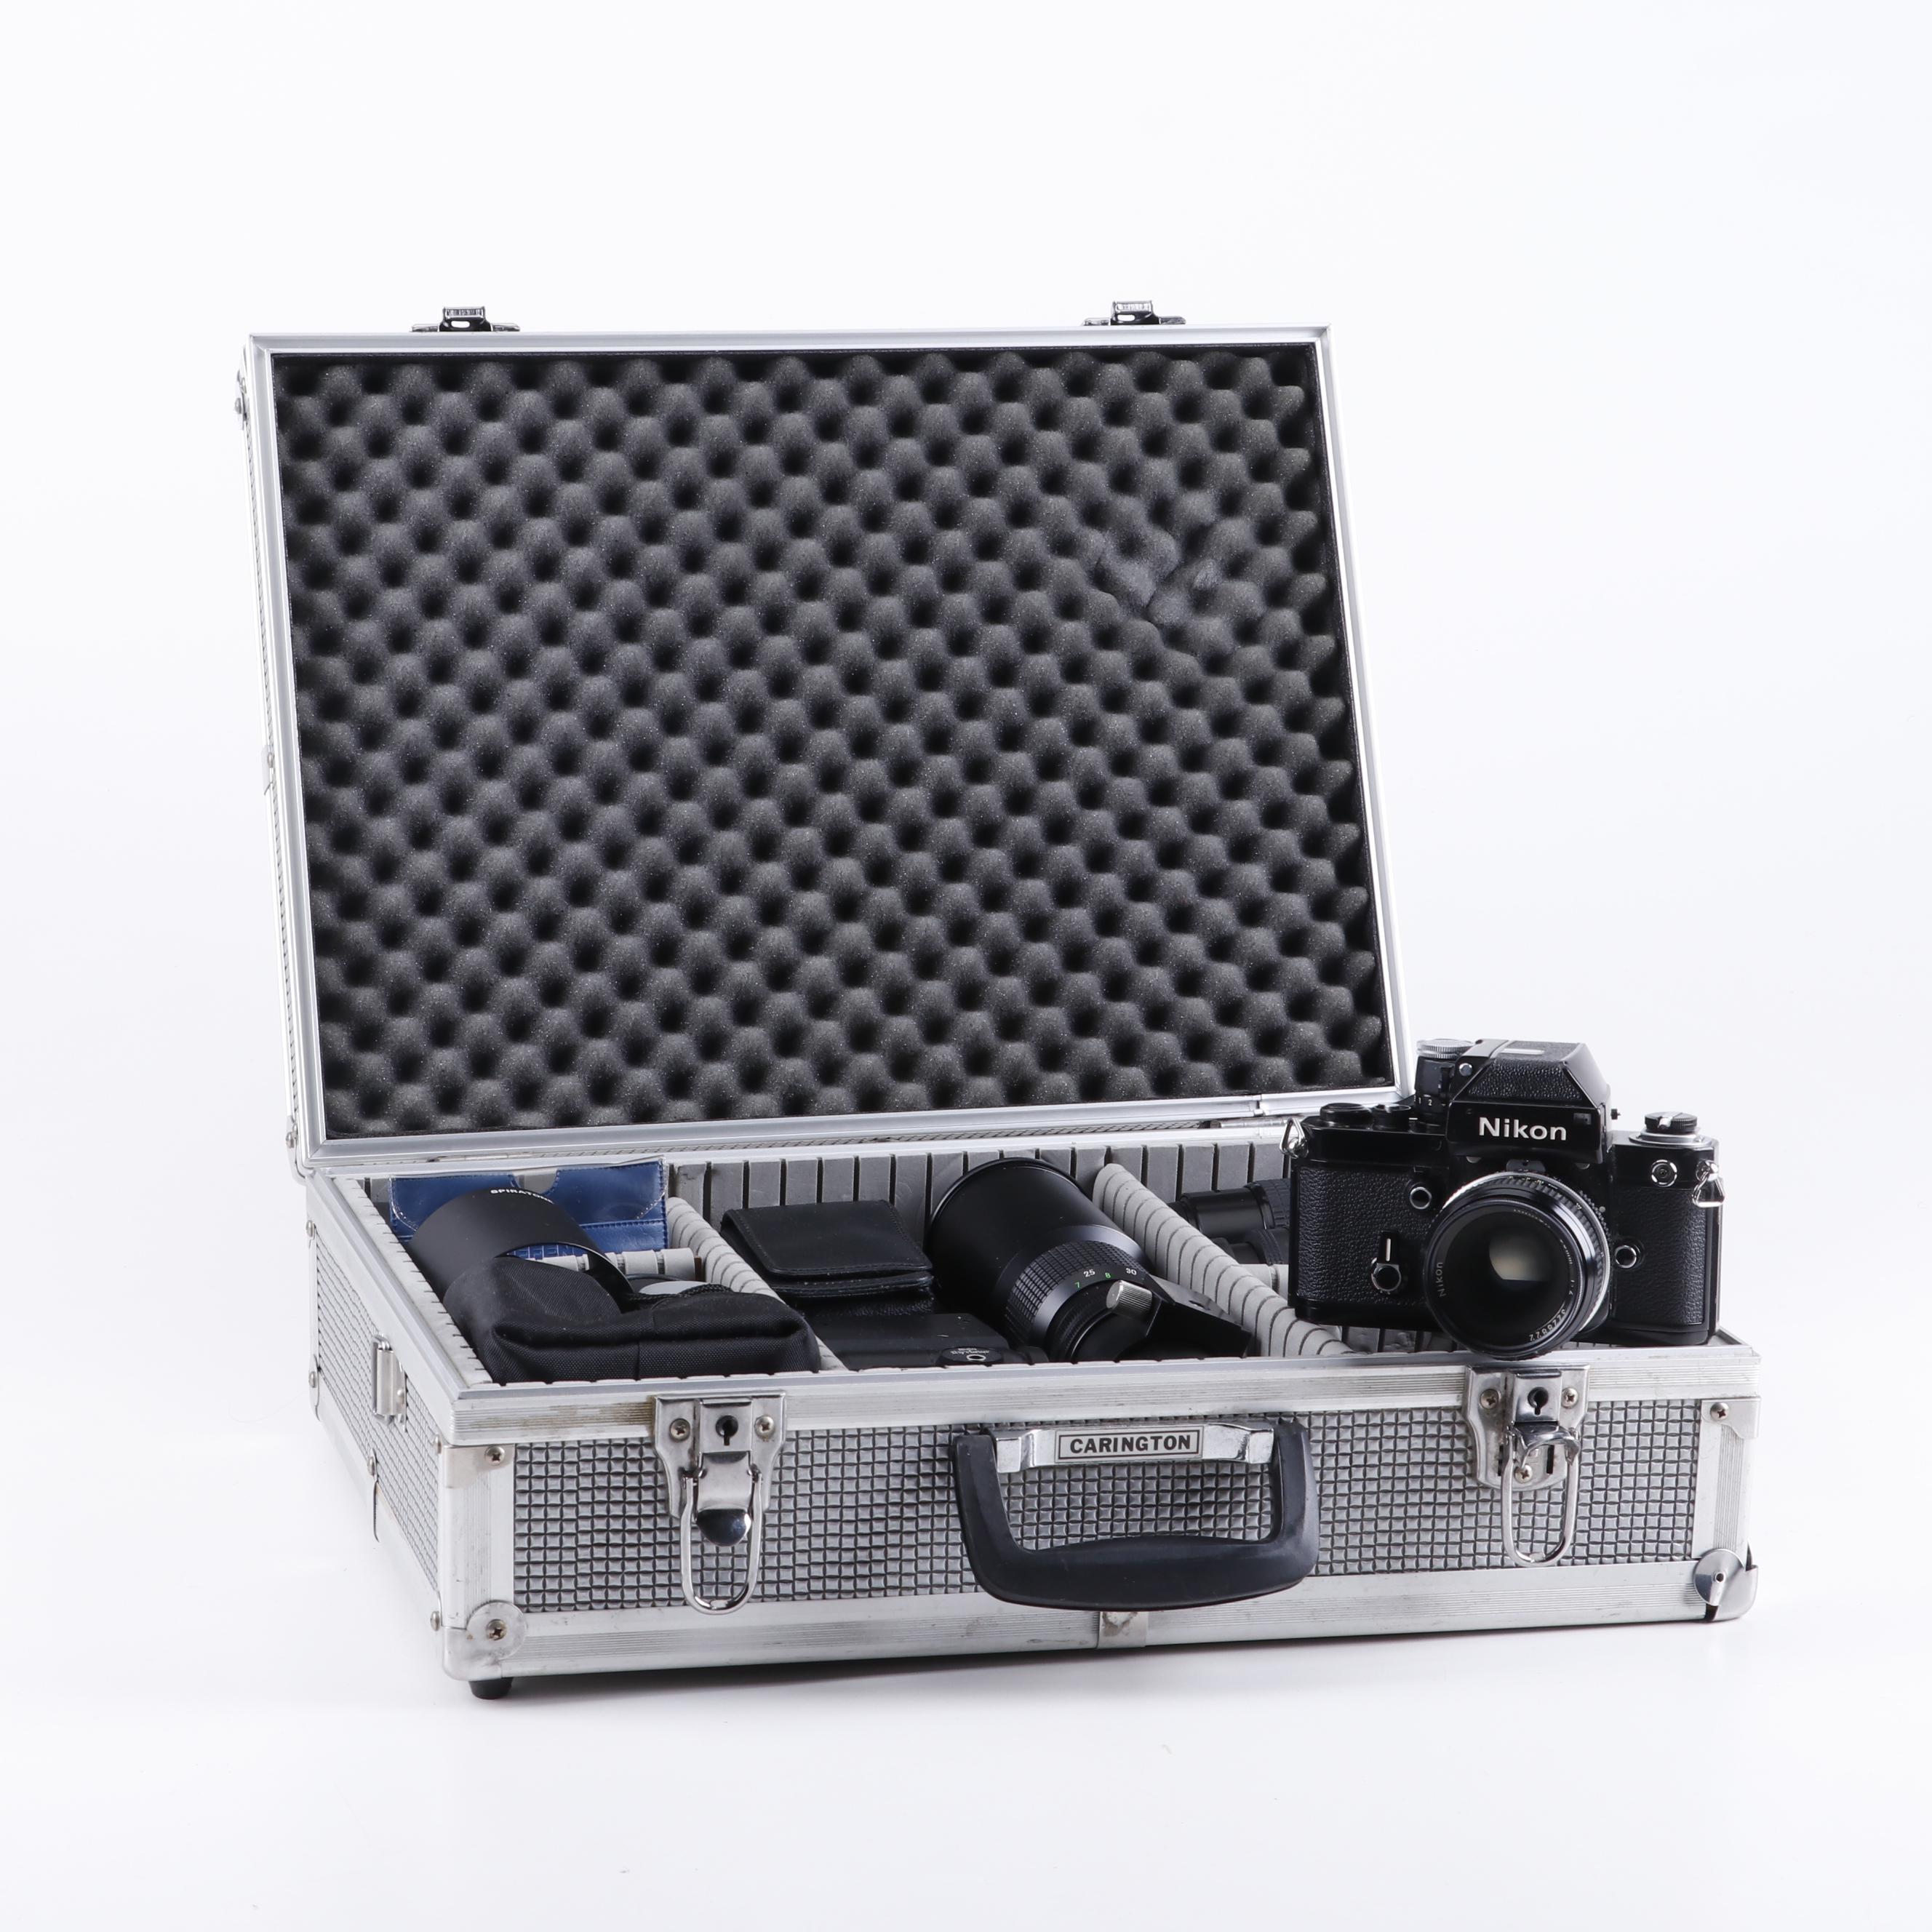 Nikon F2 SLR Camera, Lenses, Accessories, and Hard Case